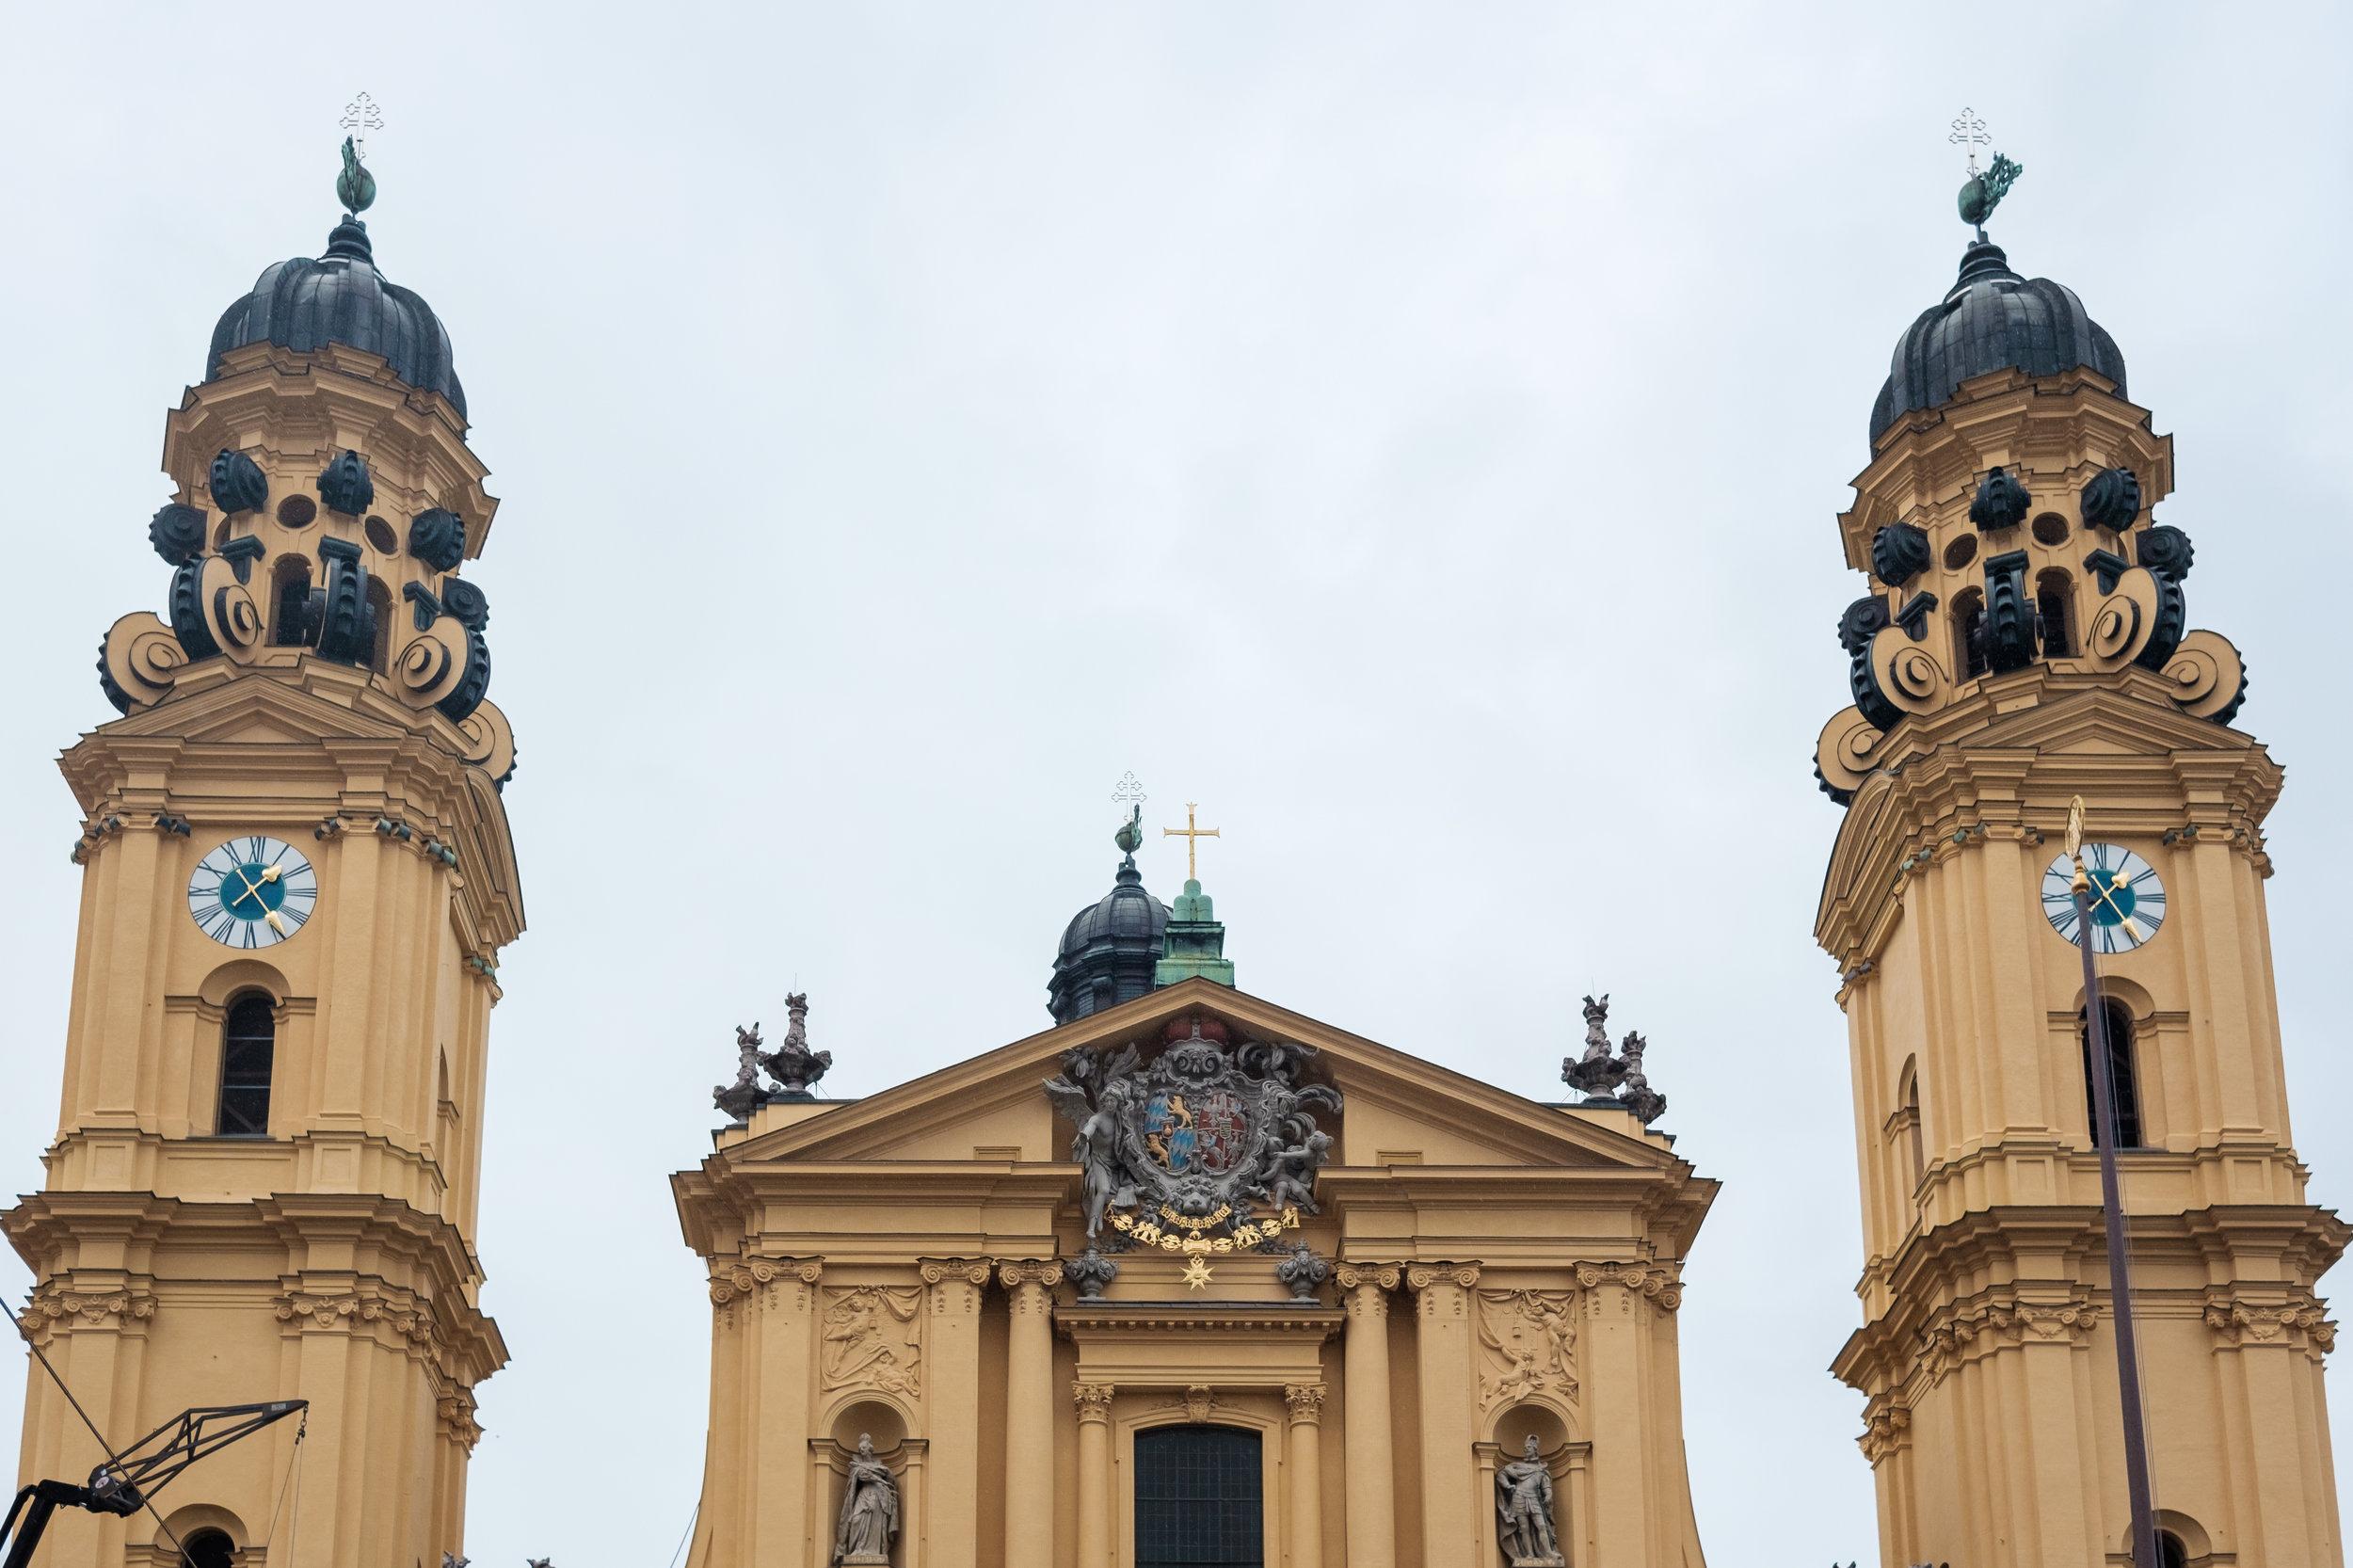 Victoria-Munich-Germany-0142.jpg